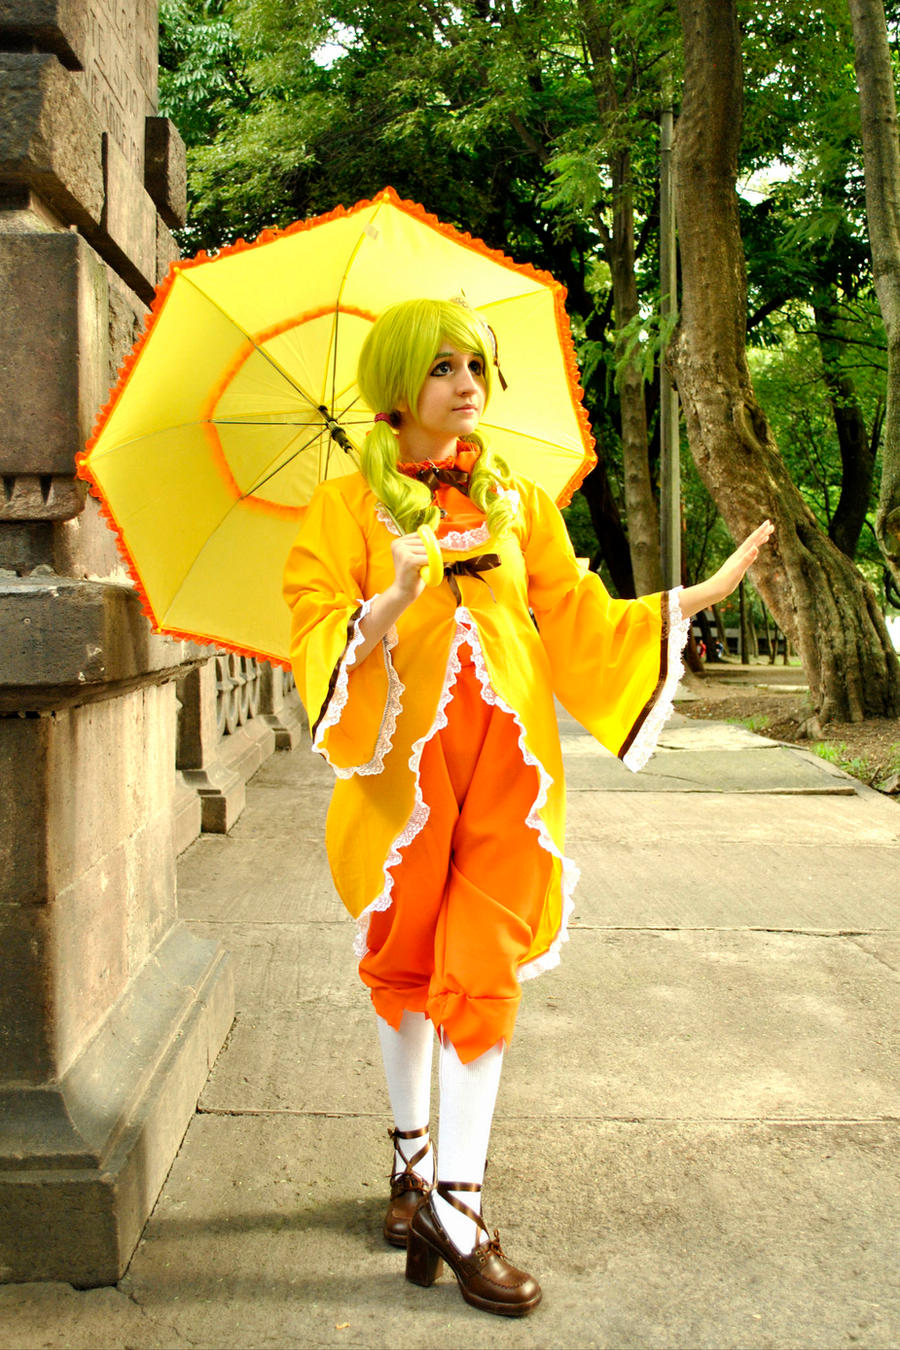 kanaria cosplay by sanchanclau